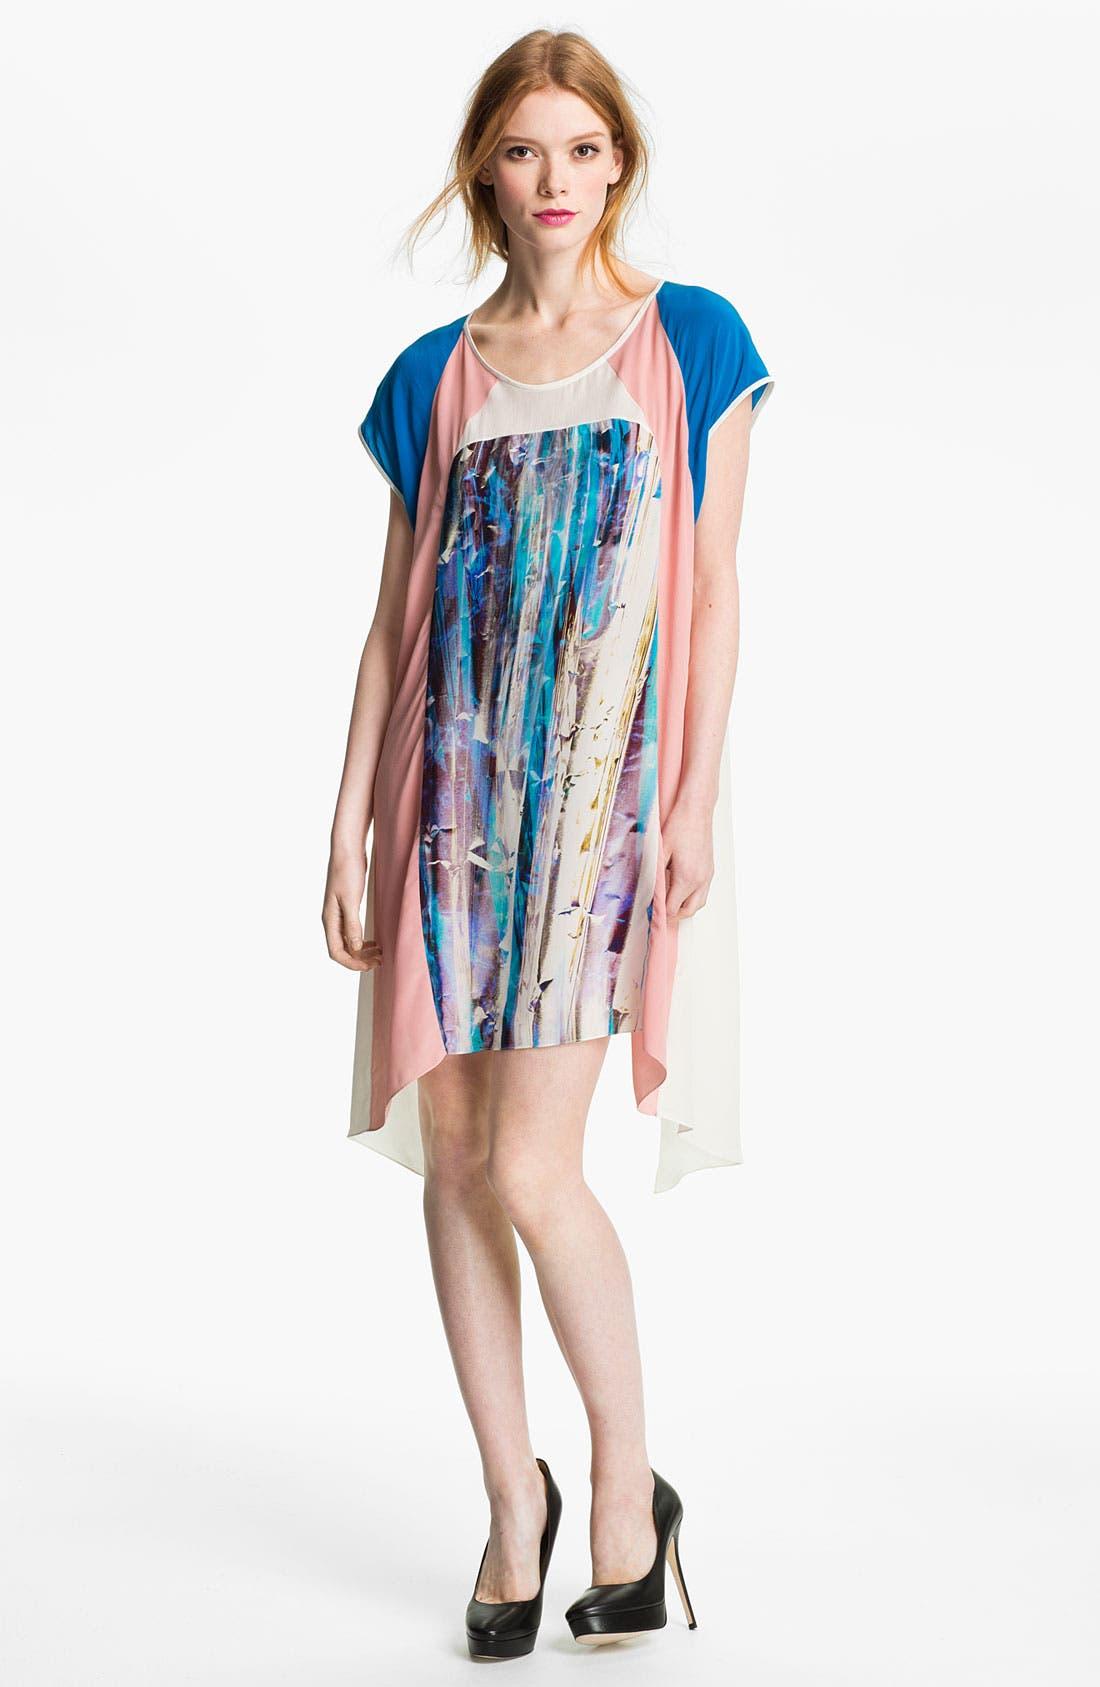 Main Image - Rebecca Minkoff 'Baseball' Colorblock Dress